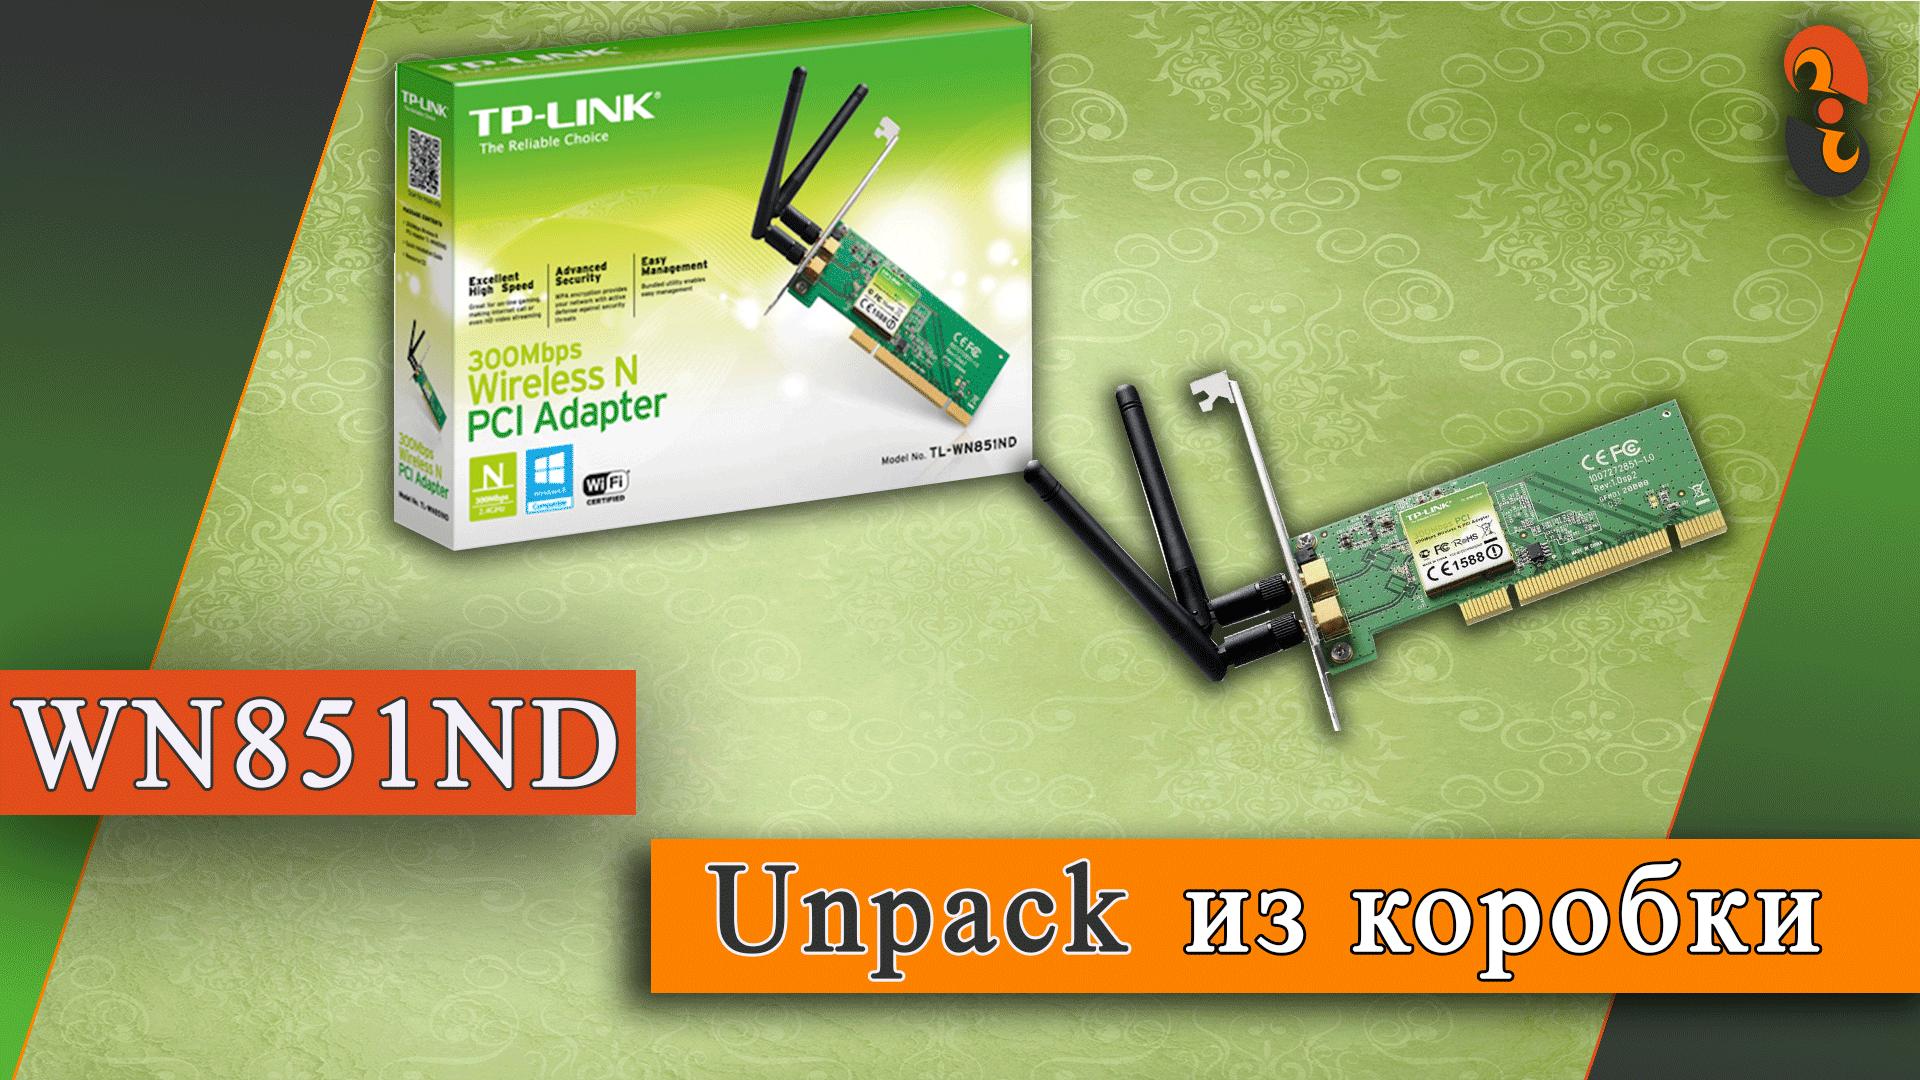 TP-Link TL-WN851ND — Распаковка (unpack) из коробки